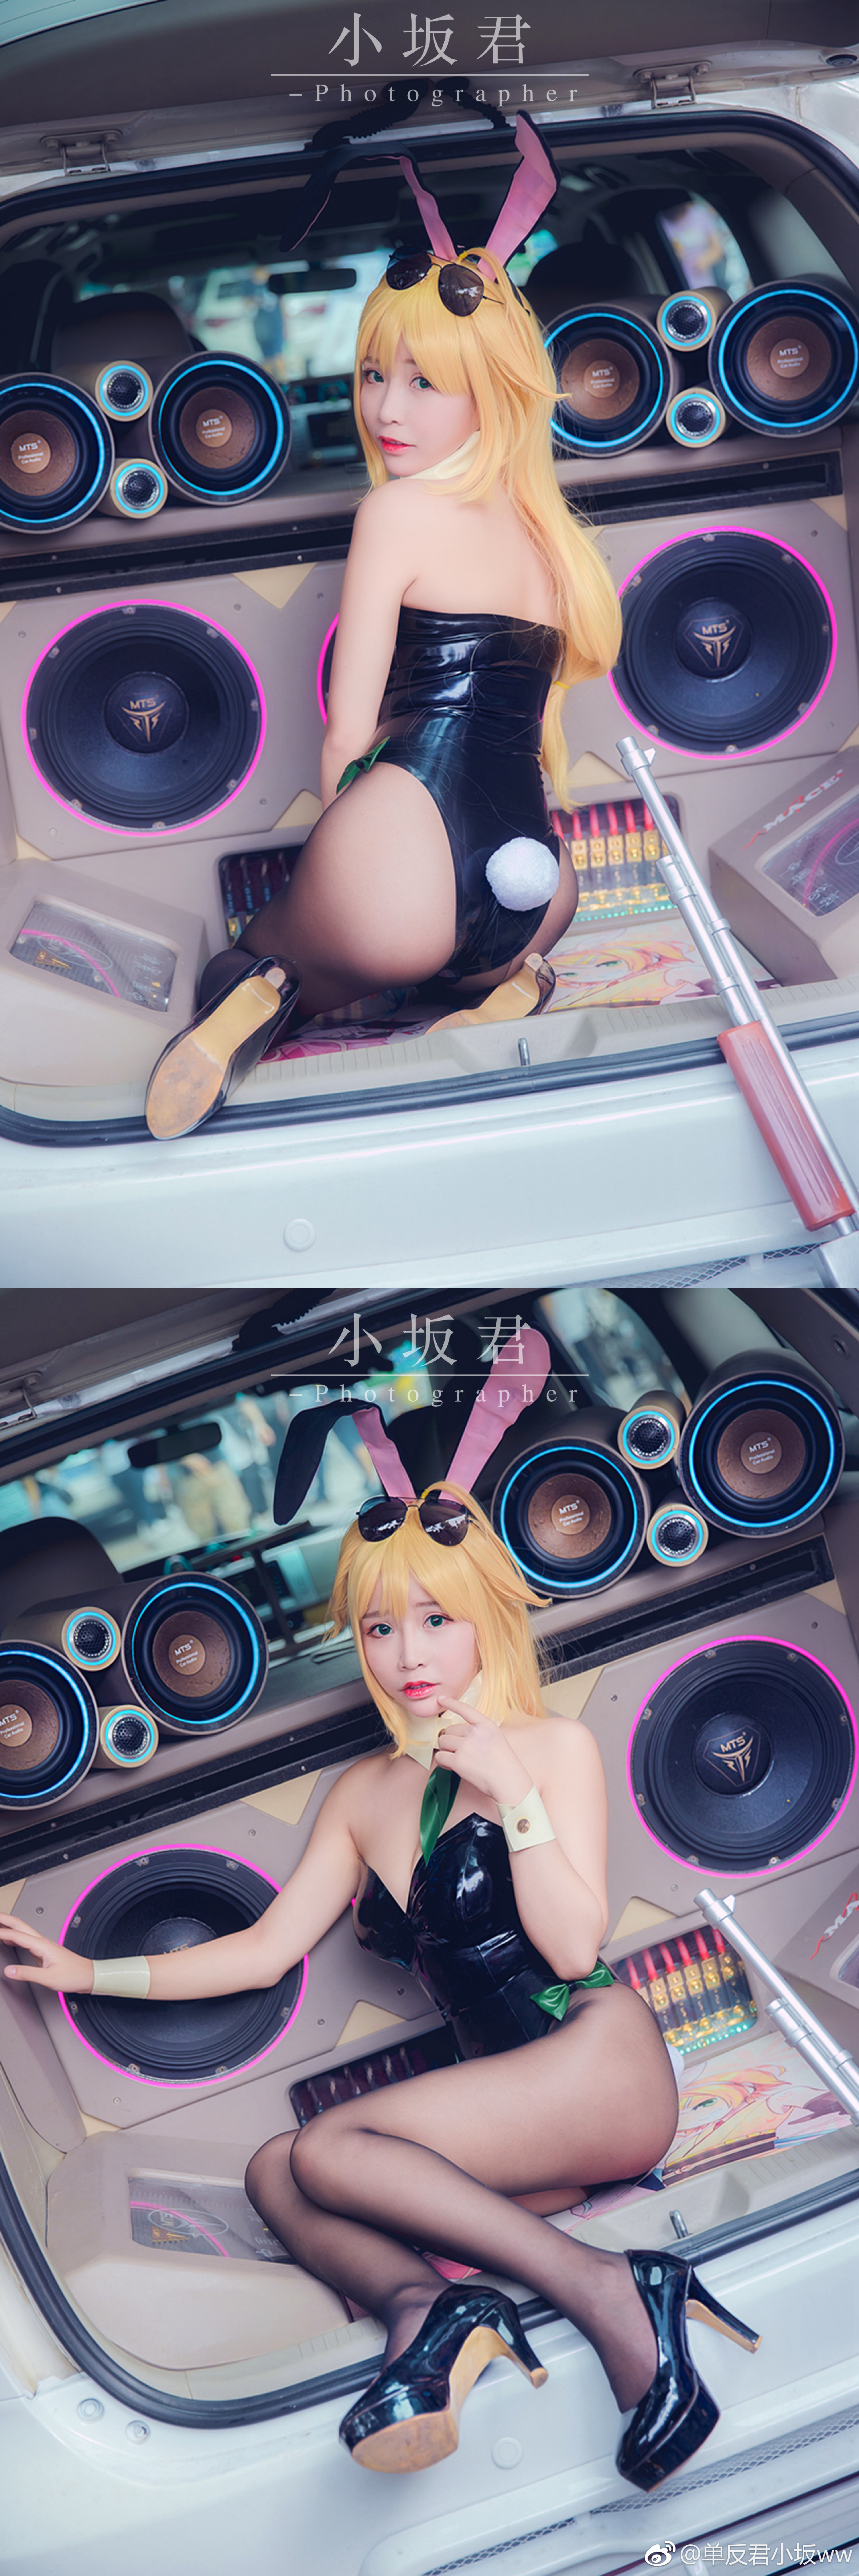 YACA动漫展上的少女前线兔女郎Cosplay(9P)